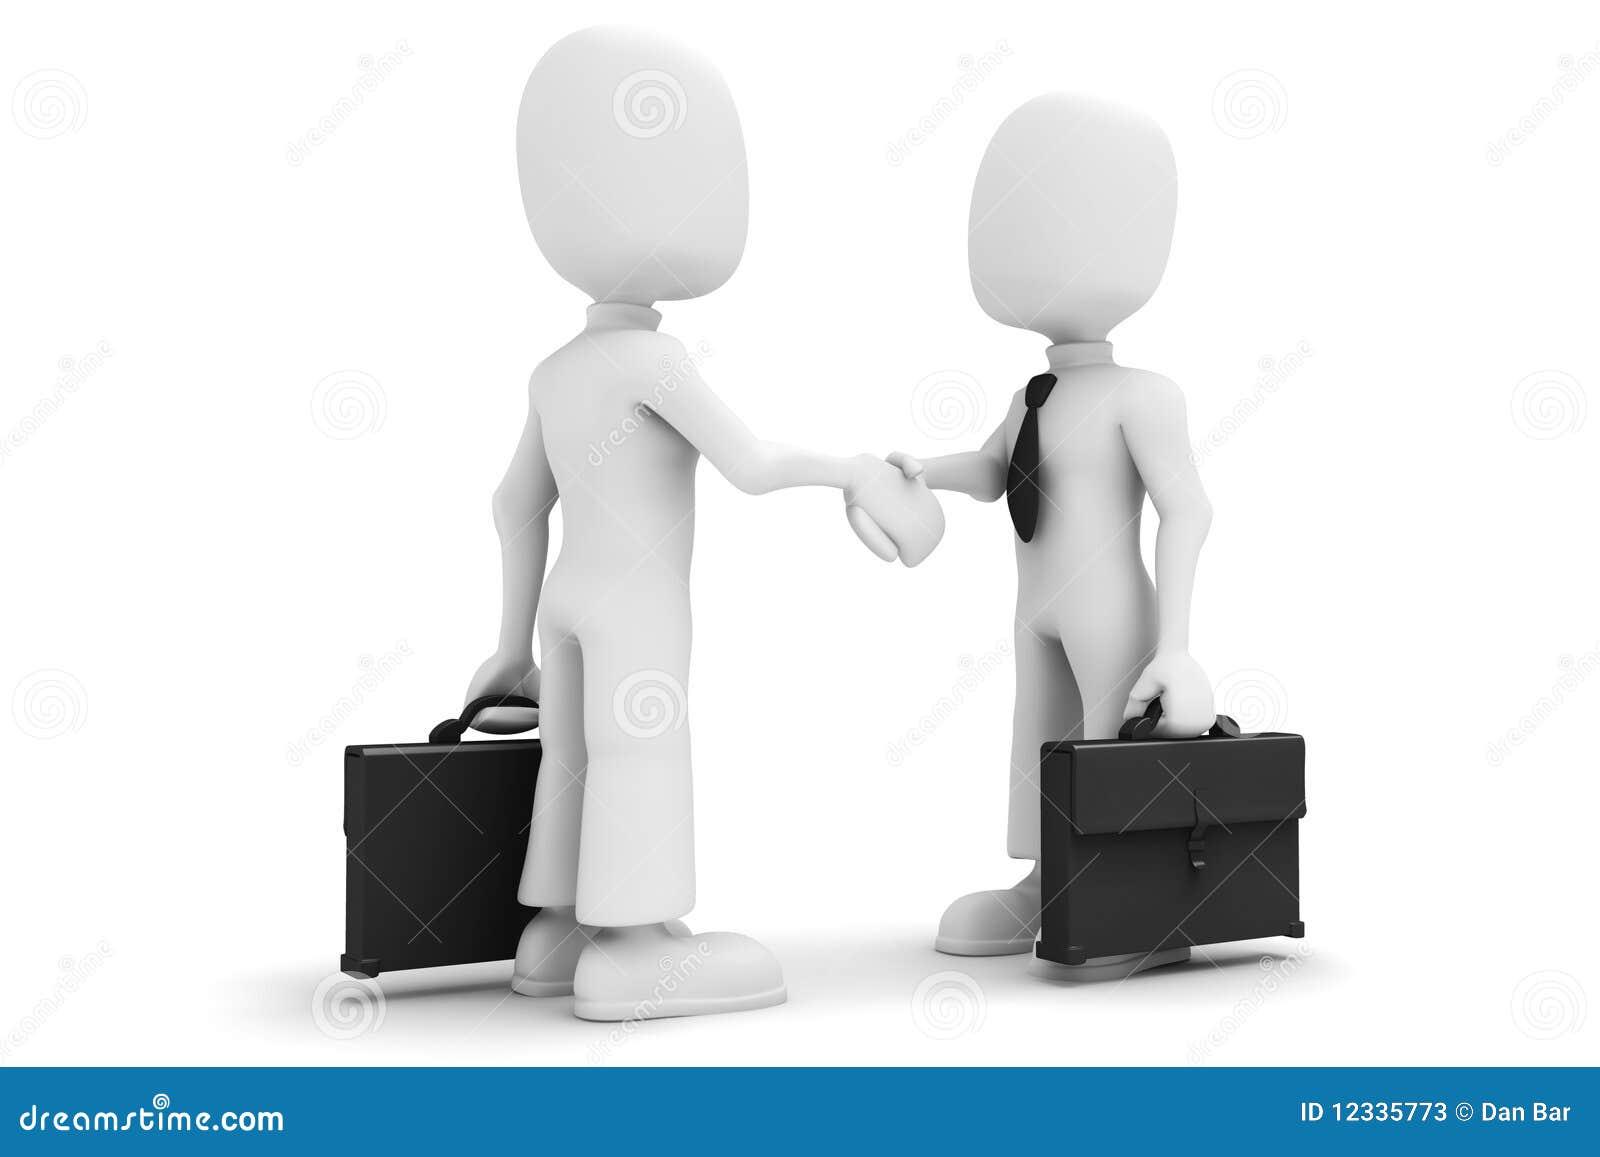 Imagens De Cumprimento: 3d Man Handshake Stock Illustration. Illustration Of